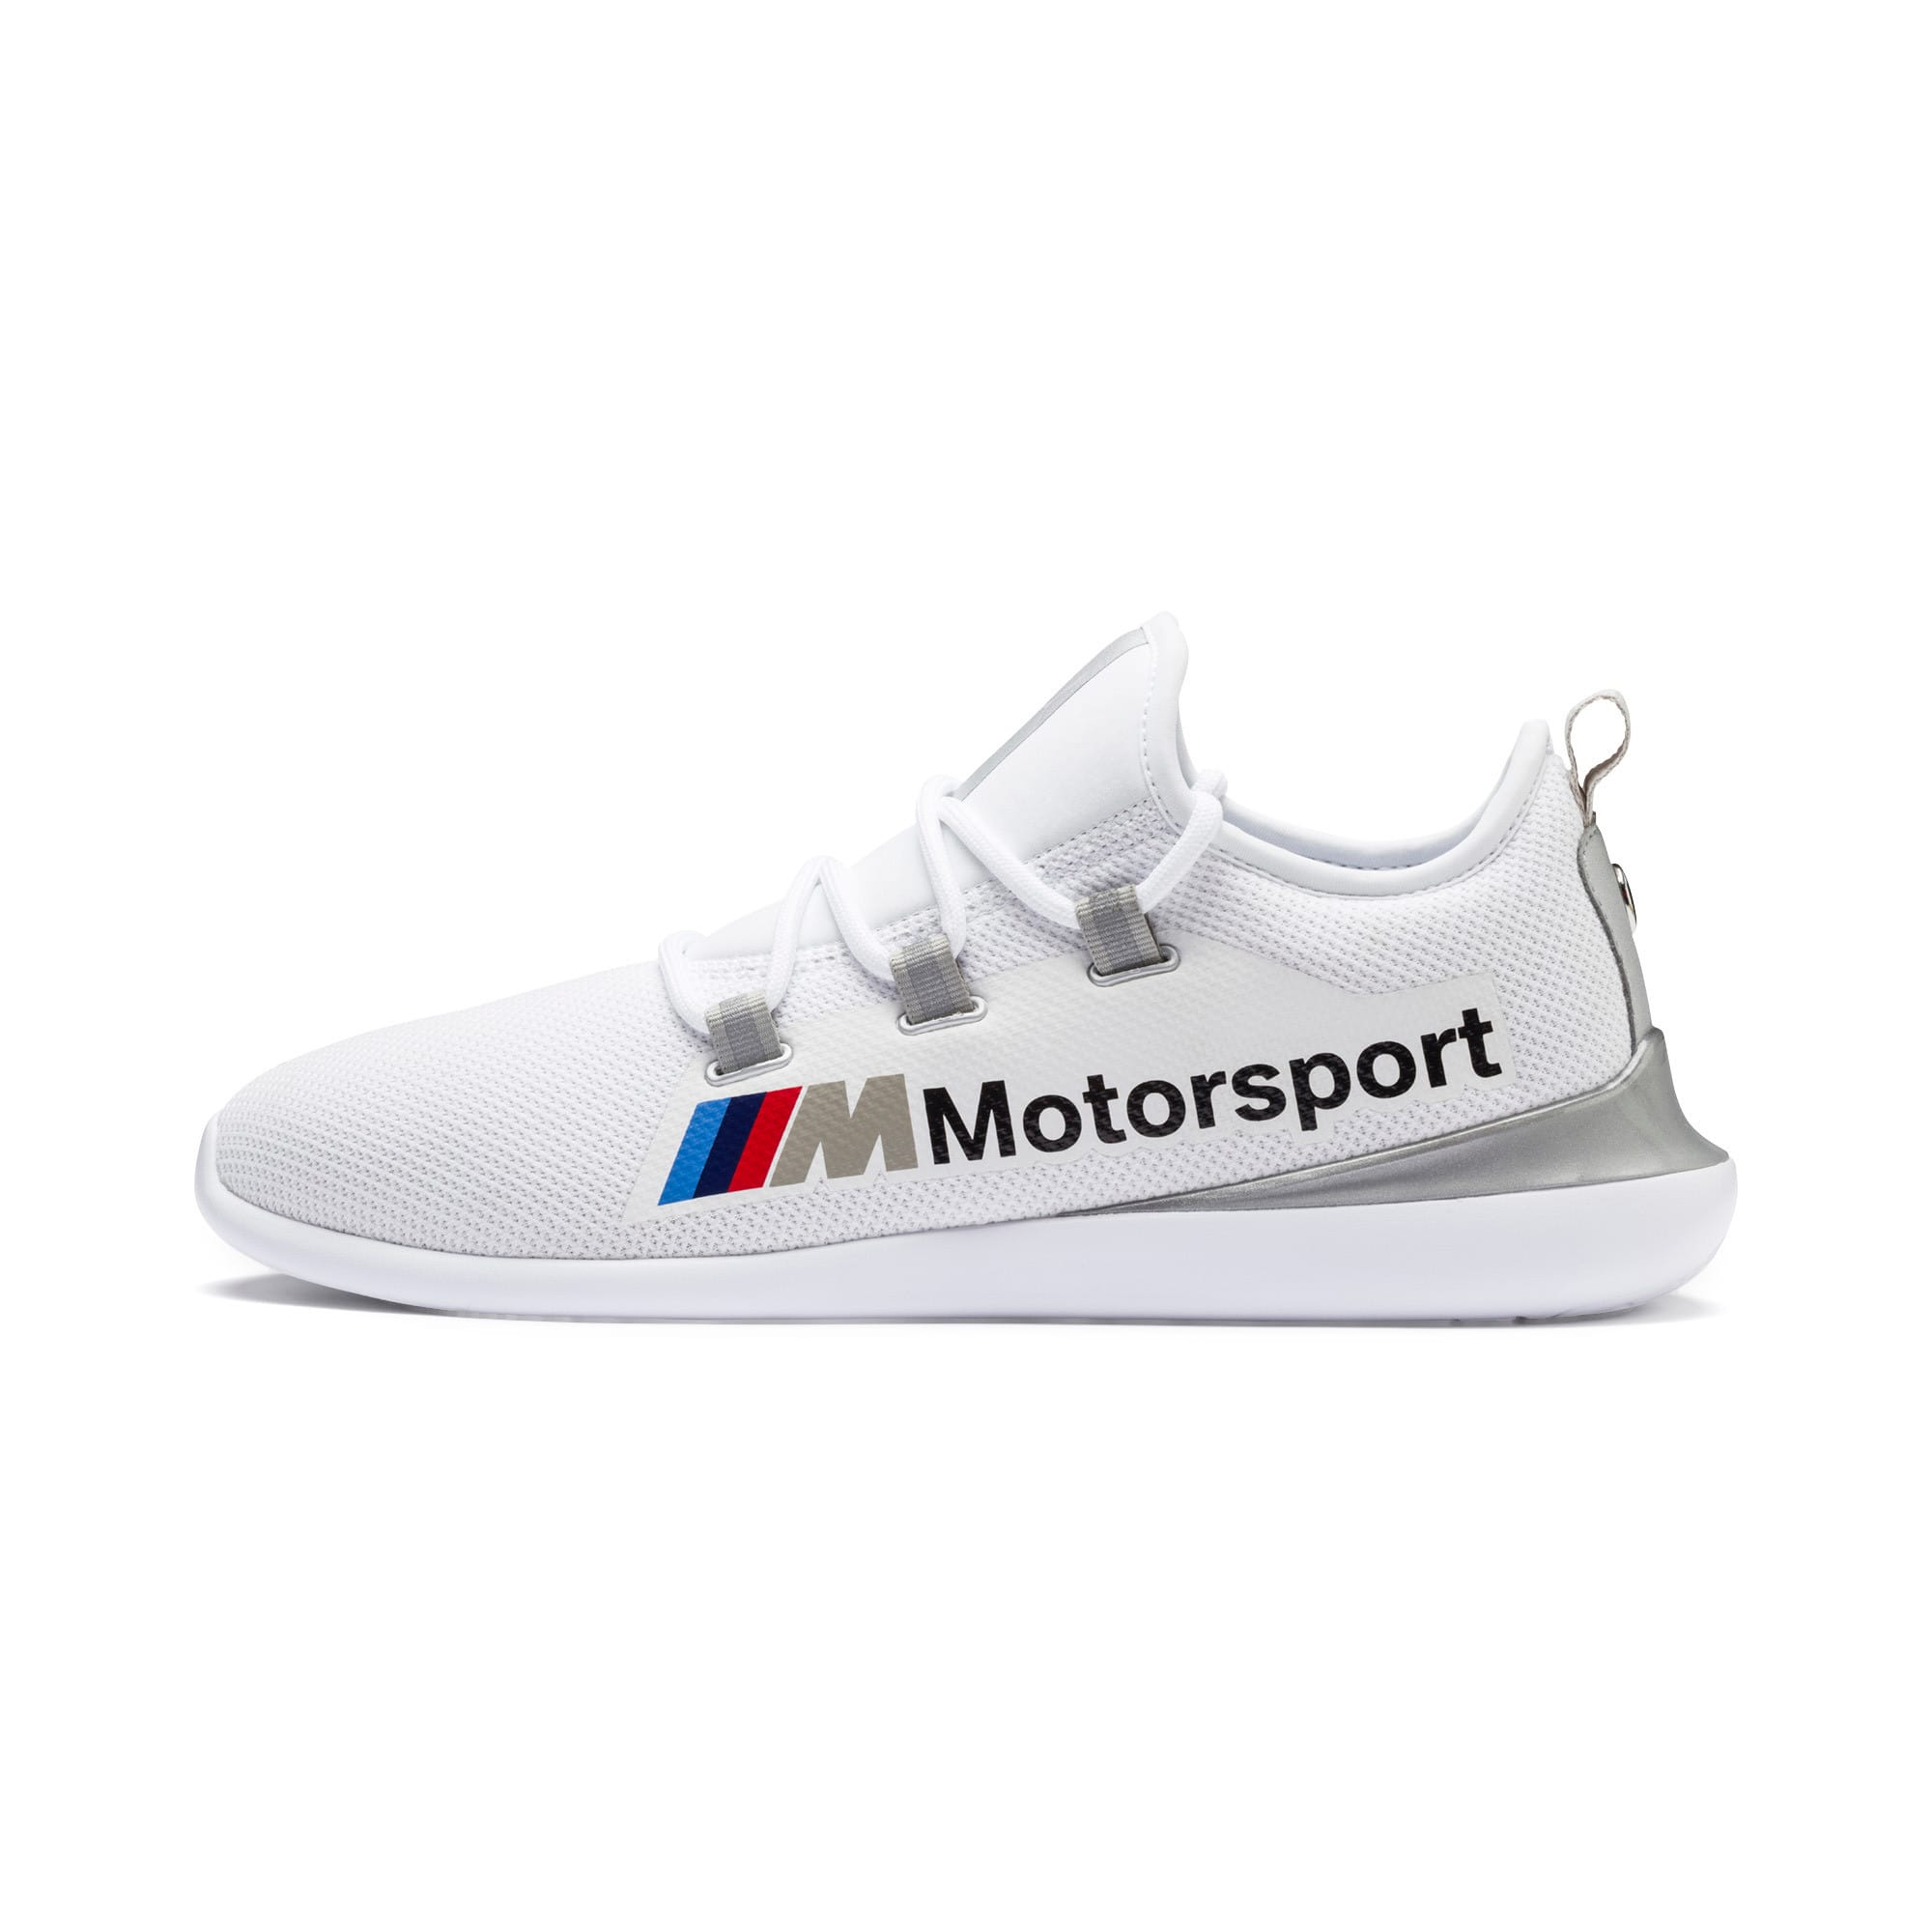 Thumbnail 1 of BMW M Motorsport Evo Cat Racer, Puma White-Puma Silver, medium